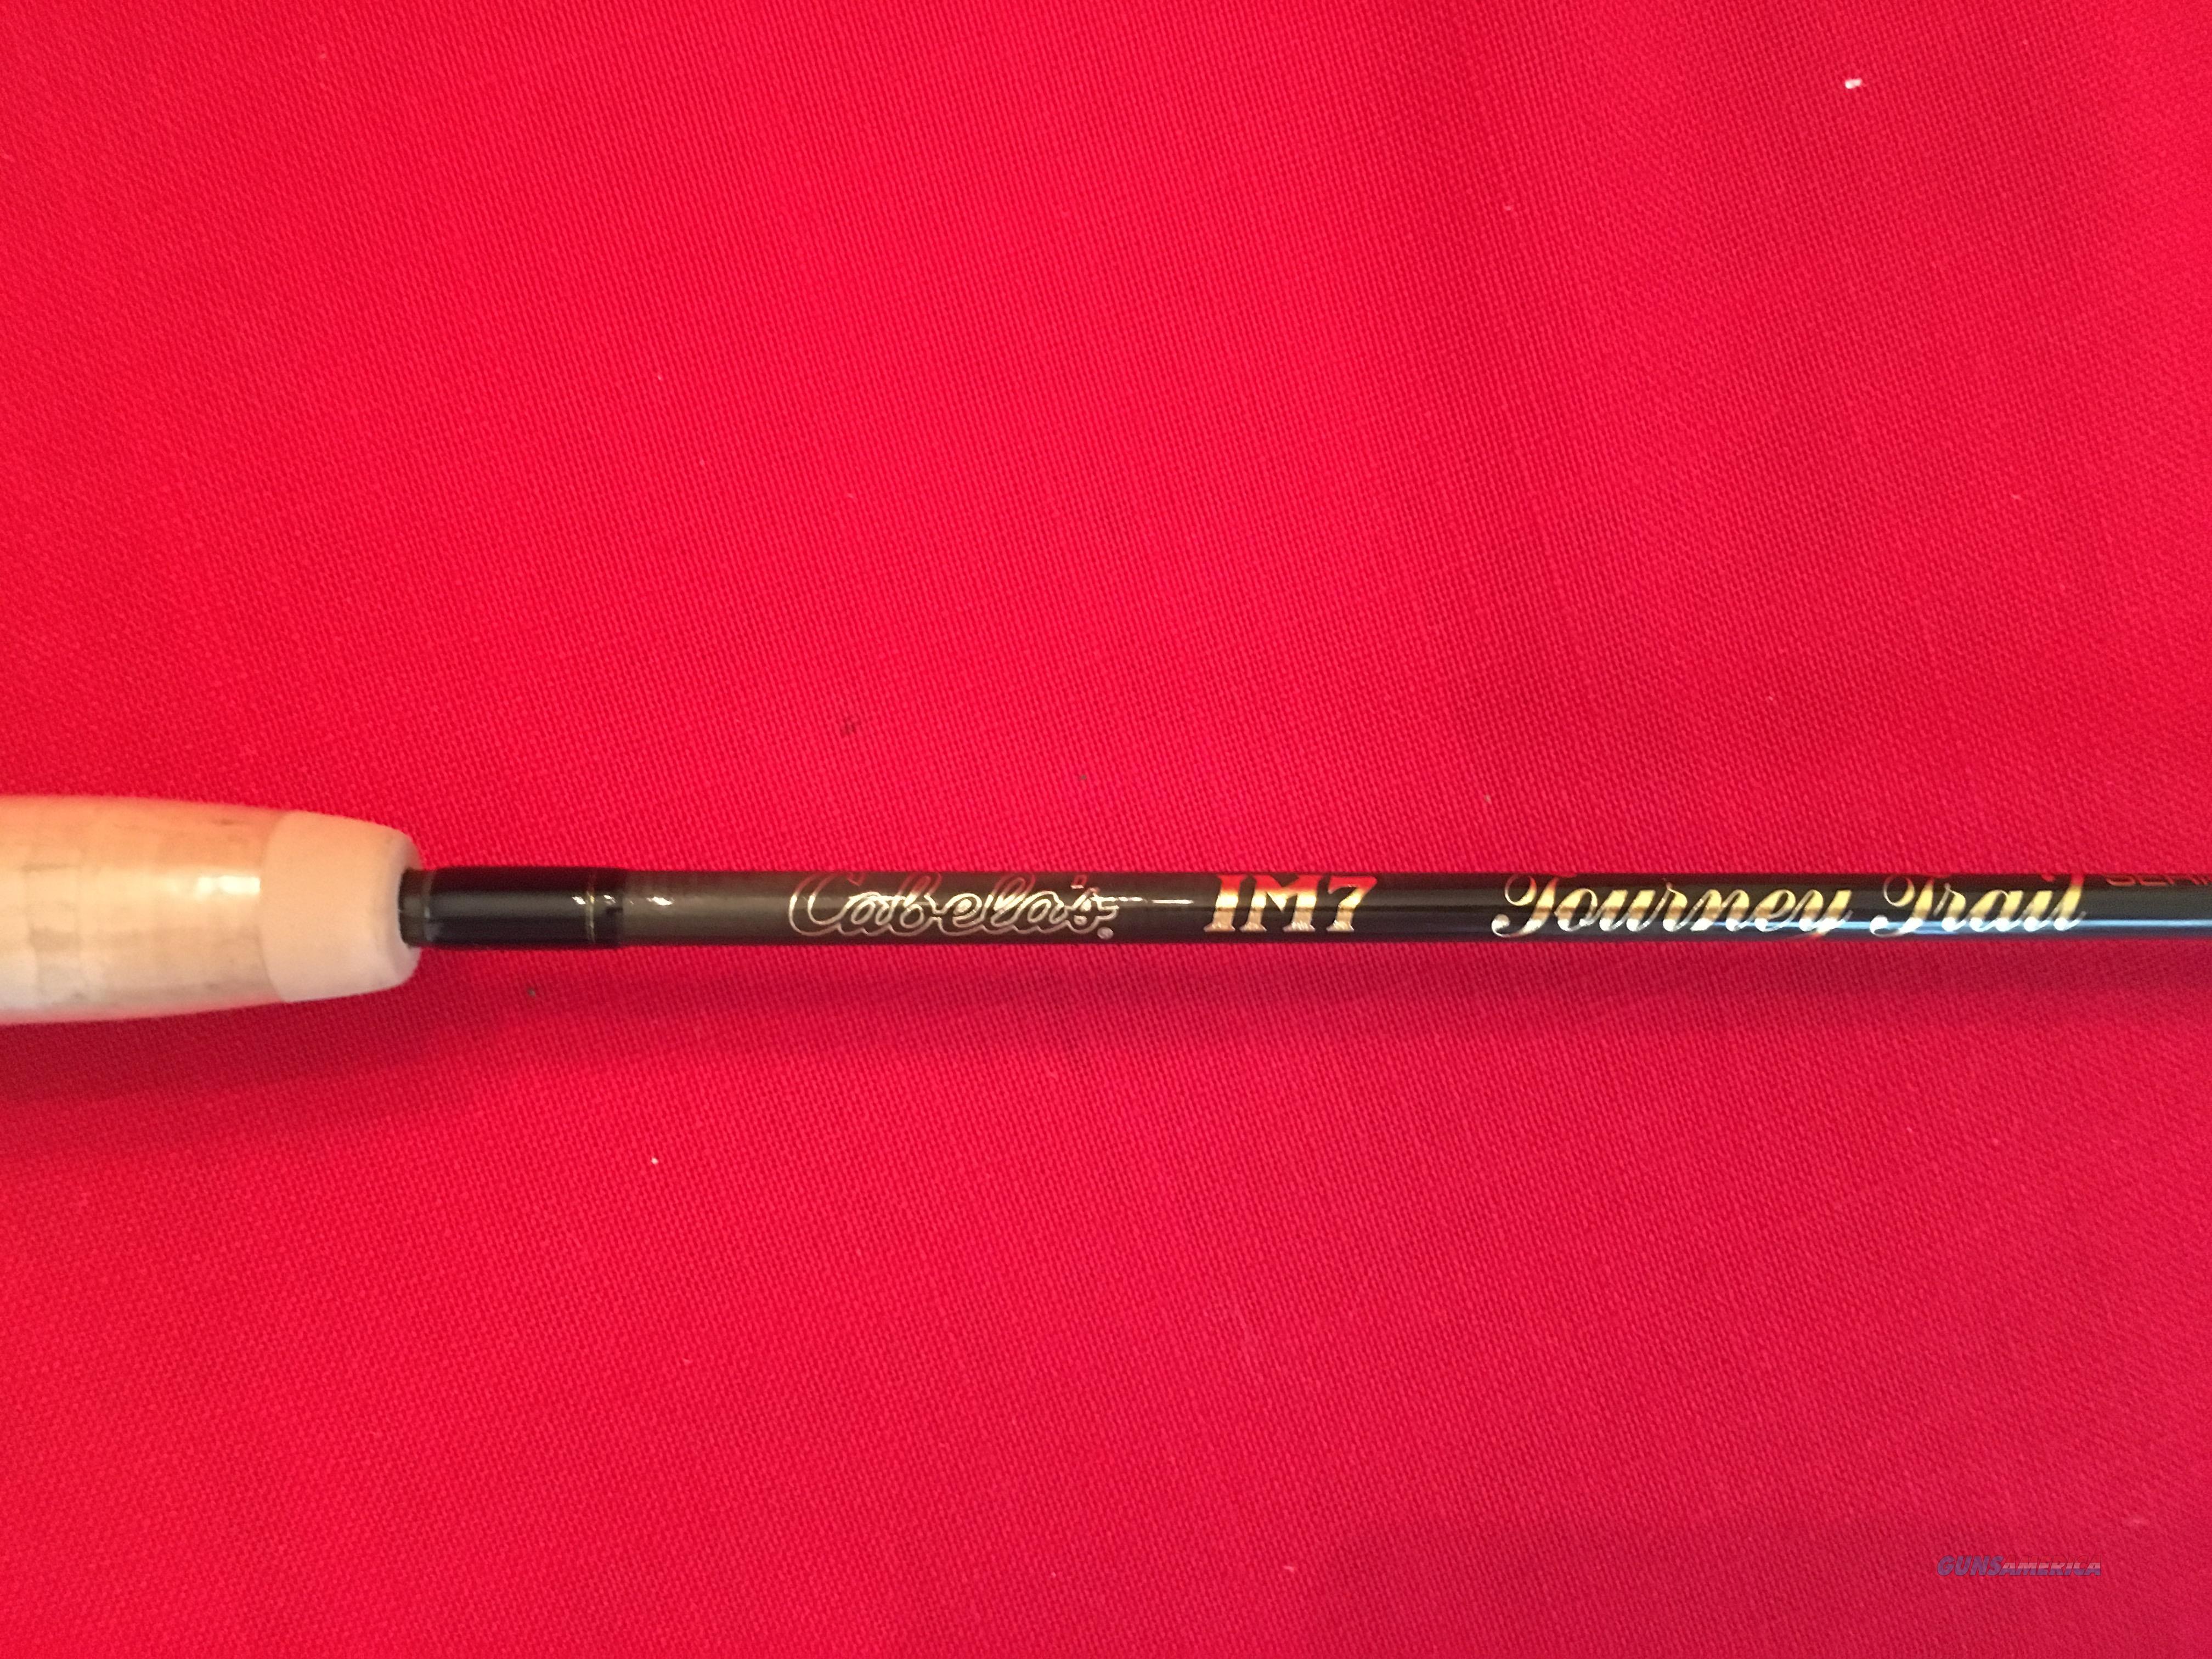 Cabela's Tourney Trail Series IM7 Graphite Casting Rod - Model No. TIMC 603  Non-Guns > Fishing/Spearfishing